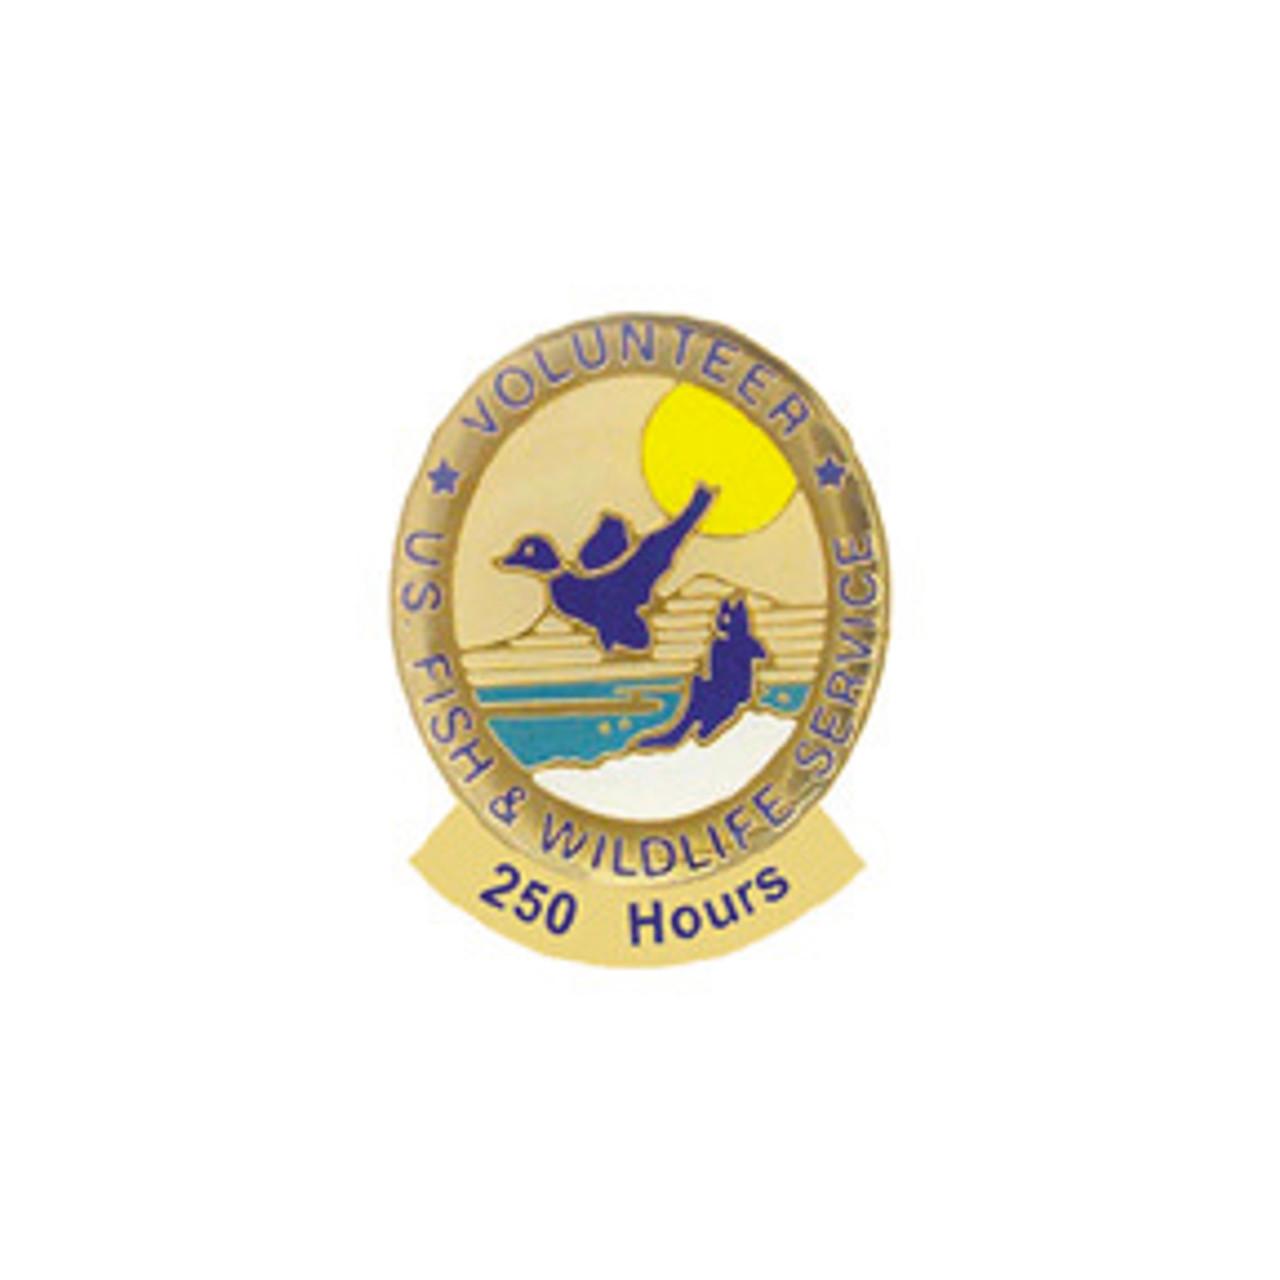 Fish & Wildlife Volunteer Hours Pin (2750 hours)